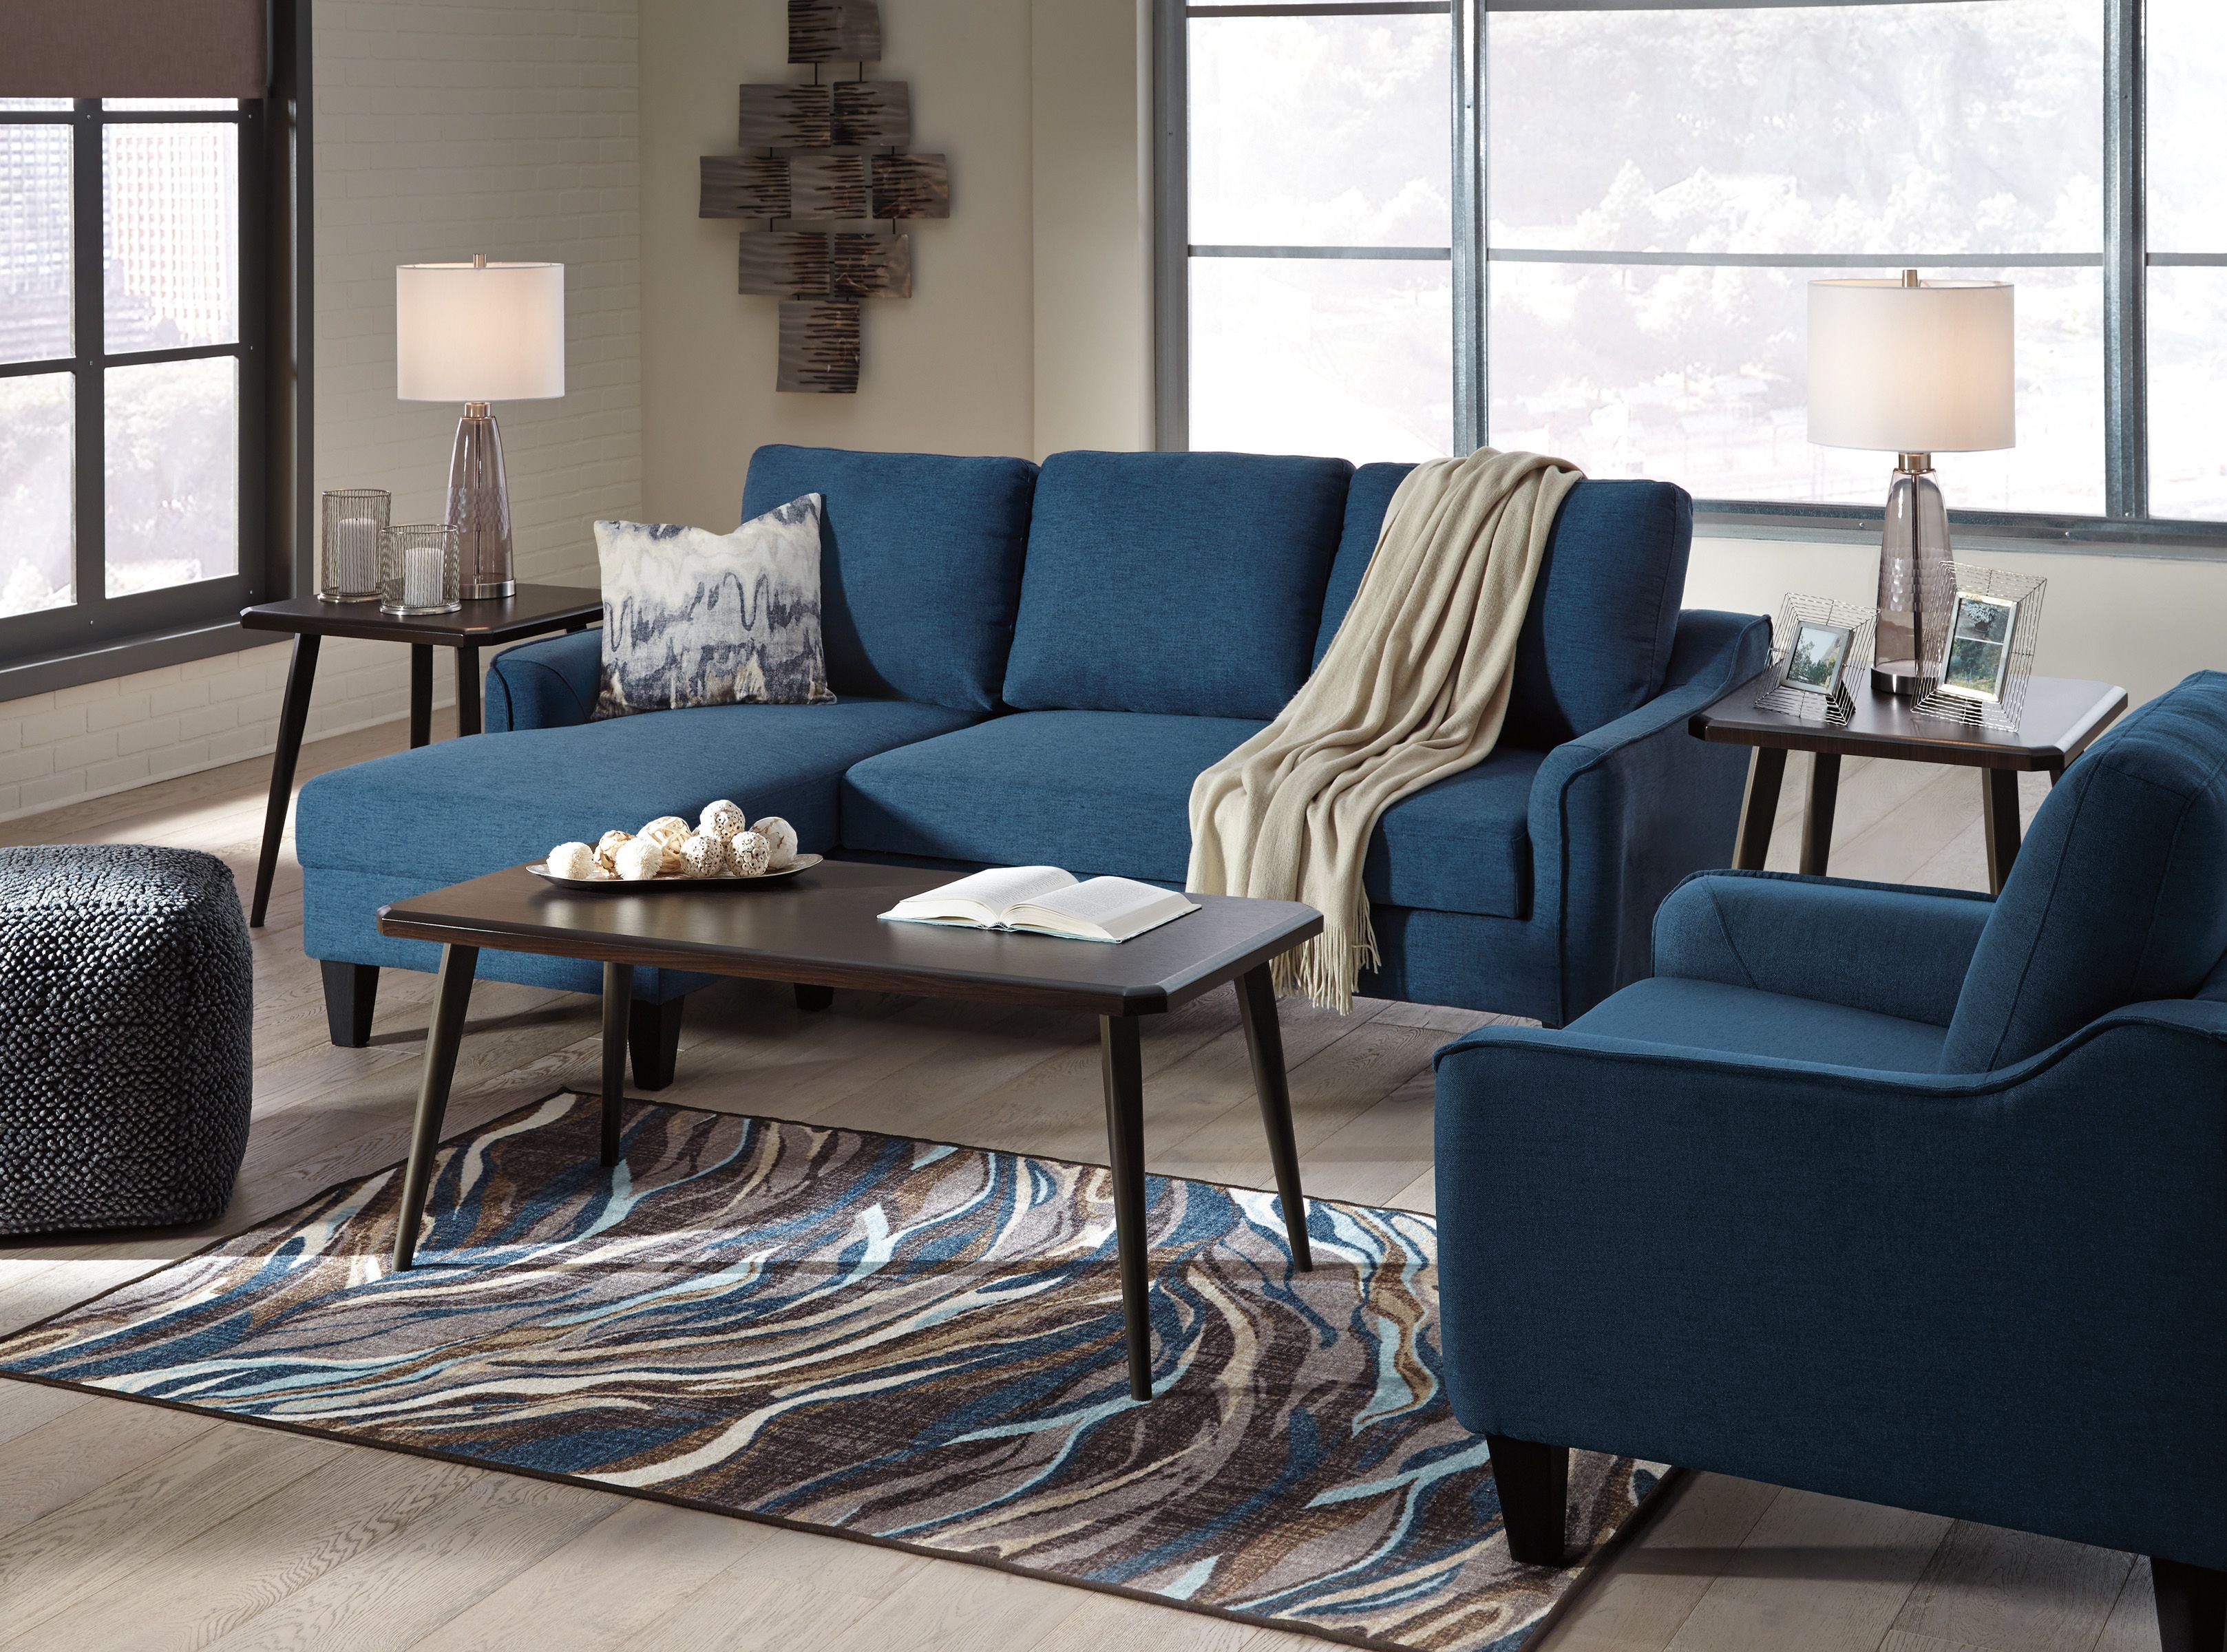 Ashley Jarreau Blue Queen Sleeper Sectional Sofa Chaise Homemakers Furniture Interior Design Styles 101 In 2019 Chaise Sofa Furniture Queen Sofa Sleeper